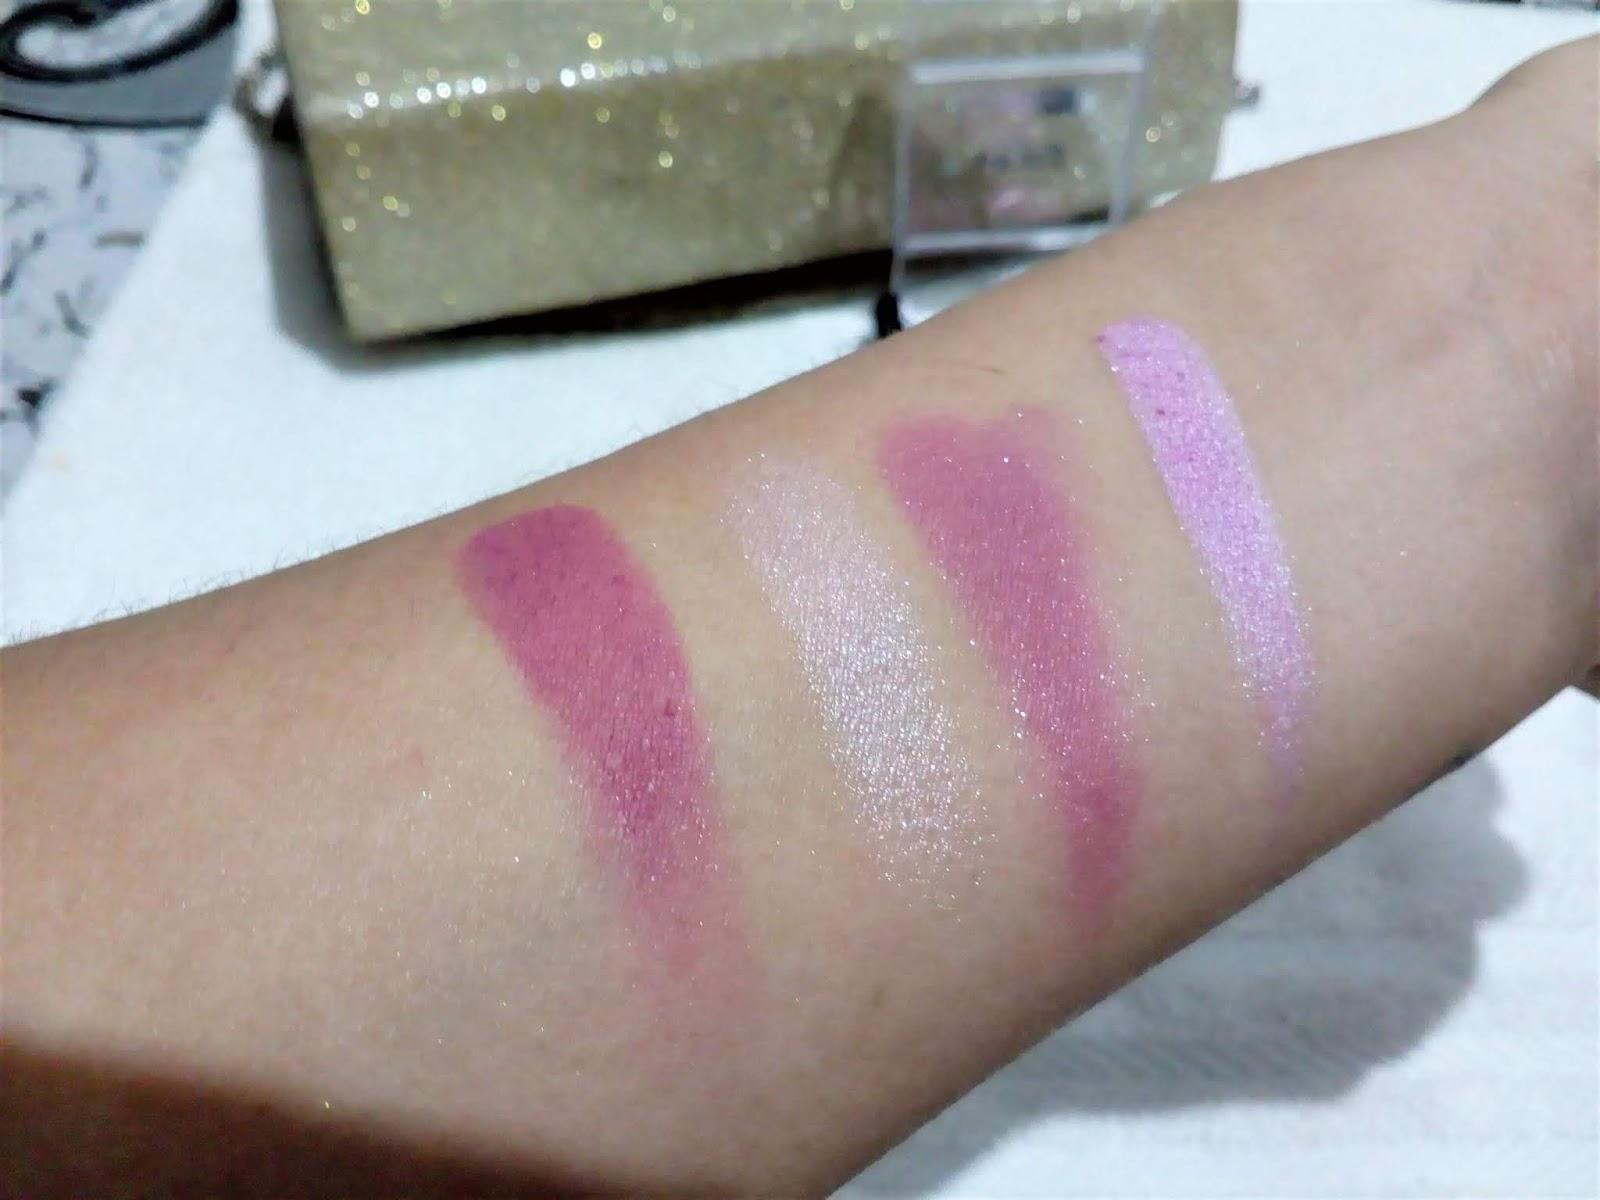 Resenha: Quarteto de sombras da Mori Makeup